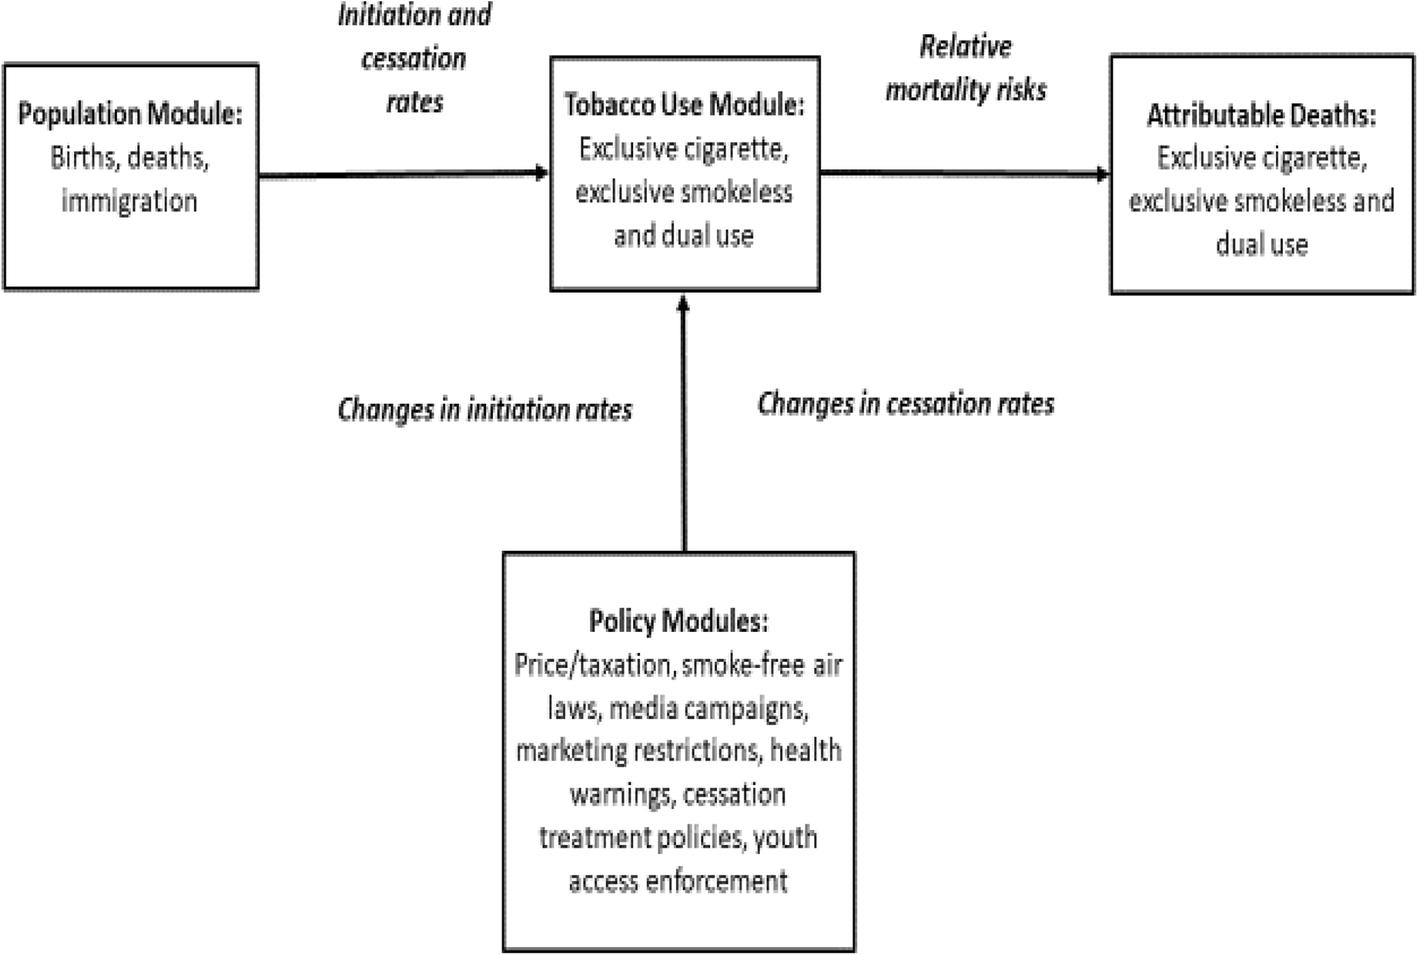 The US SimSmoke tobacco control policy model of smokeless